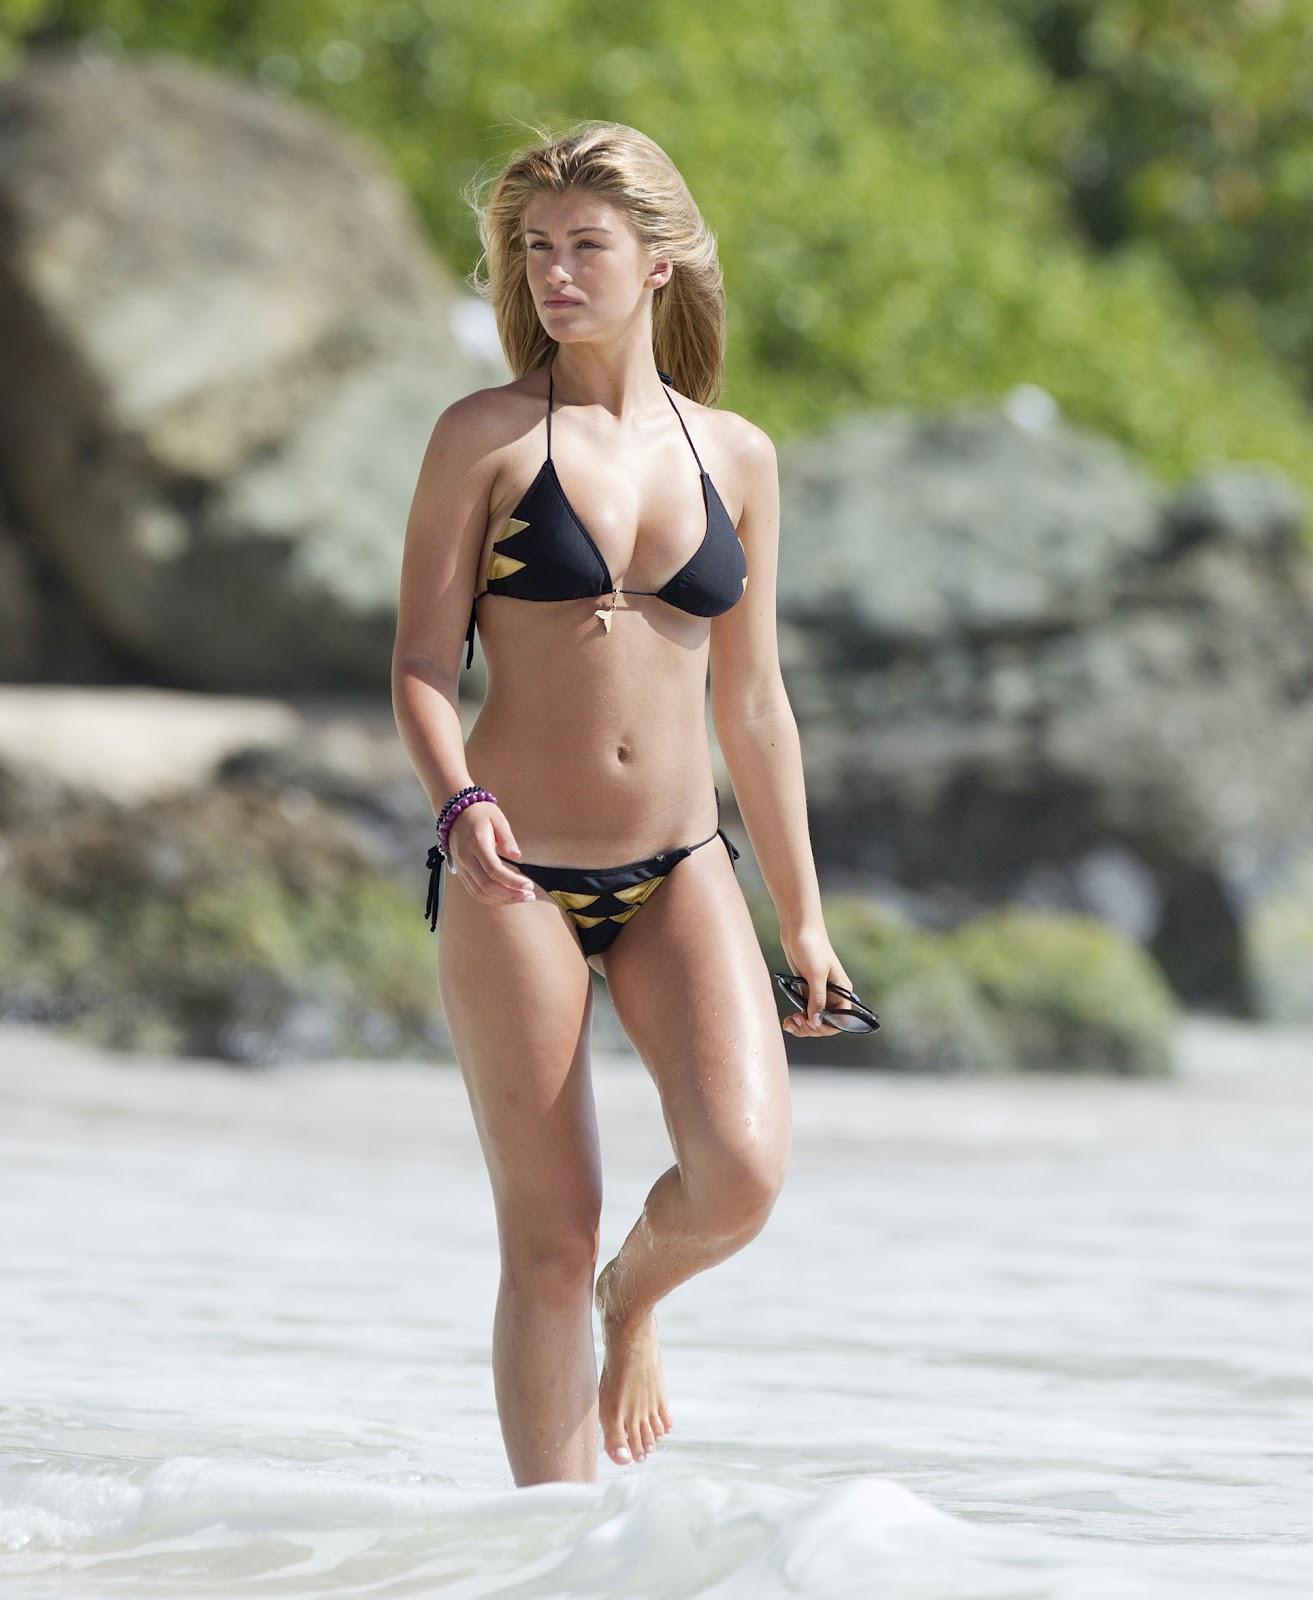 Willerton Amy Candid Bikini shots-The Perfect Bikni Body